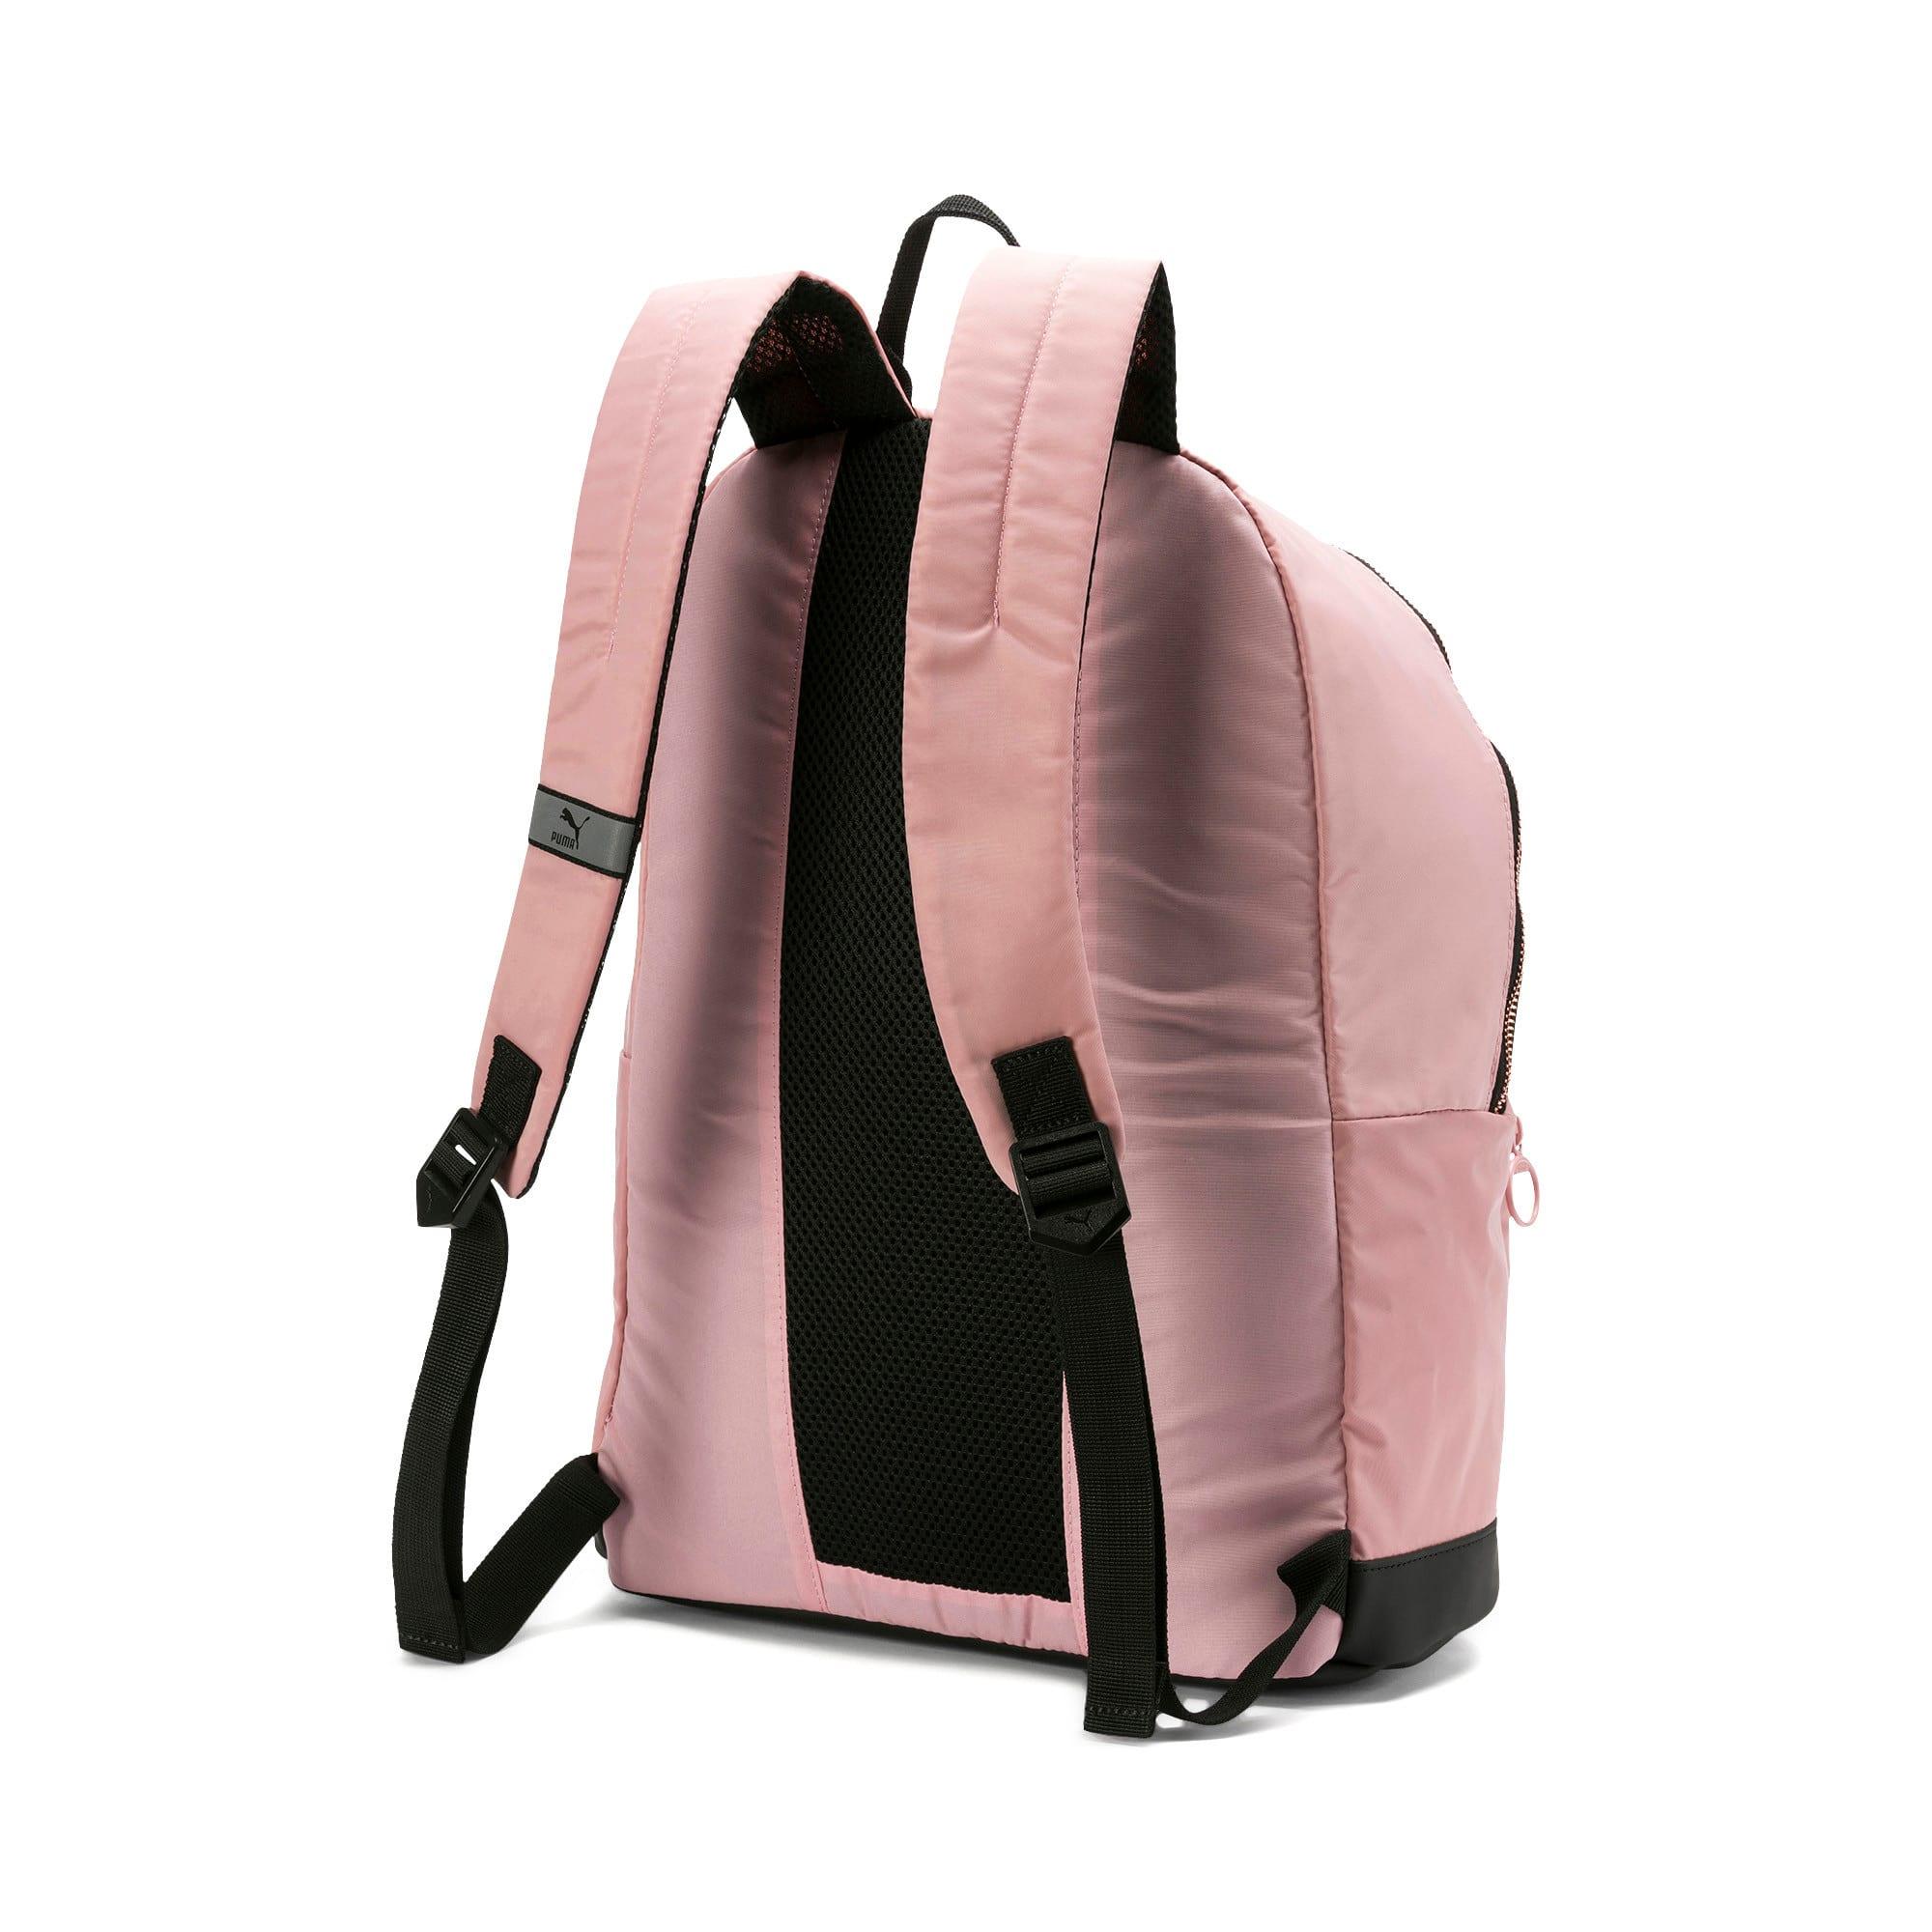 Thumbnail 3 of Originals Trend Backpack, Bridal Rose, medium-IND